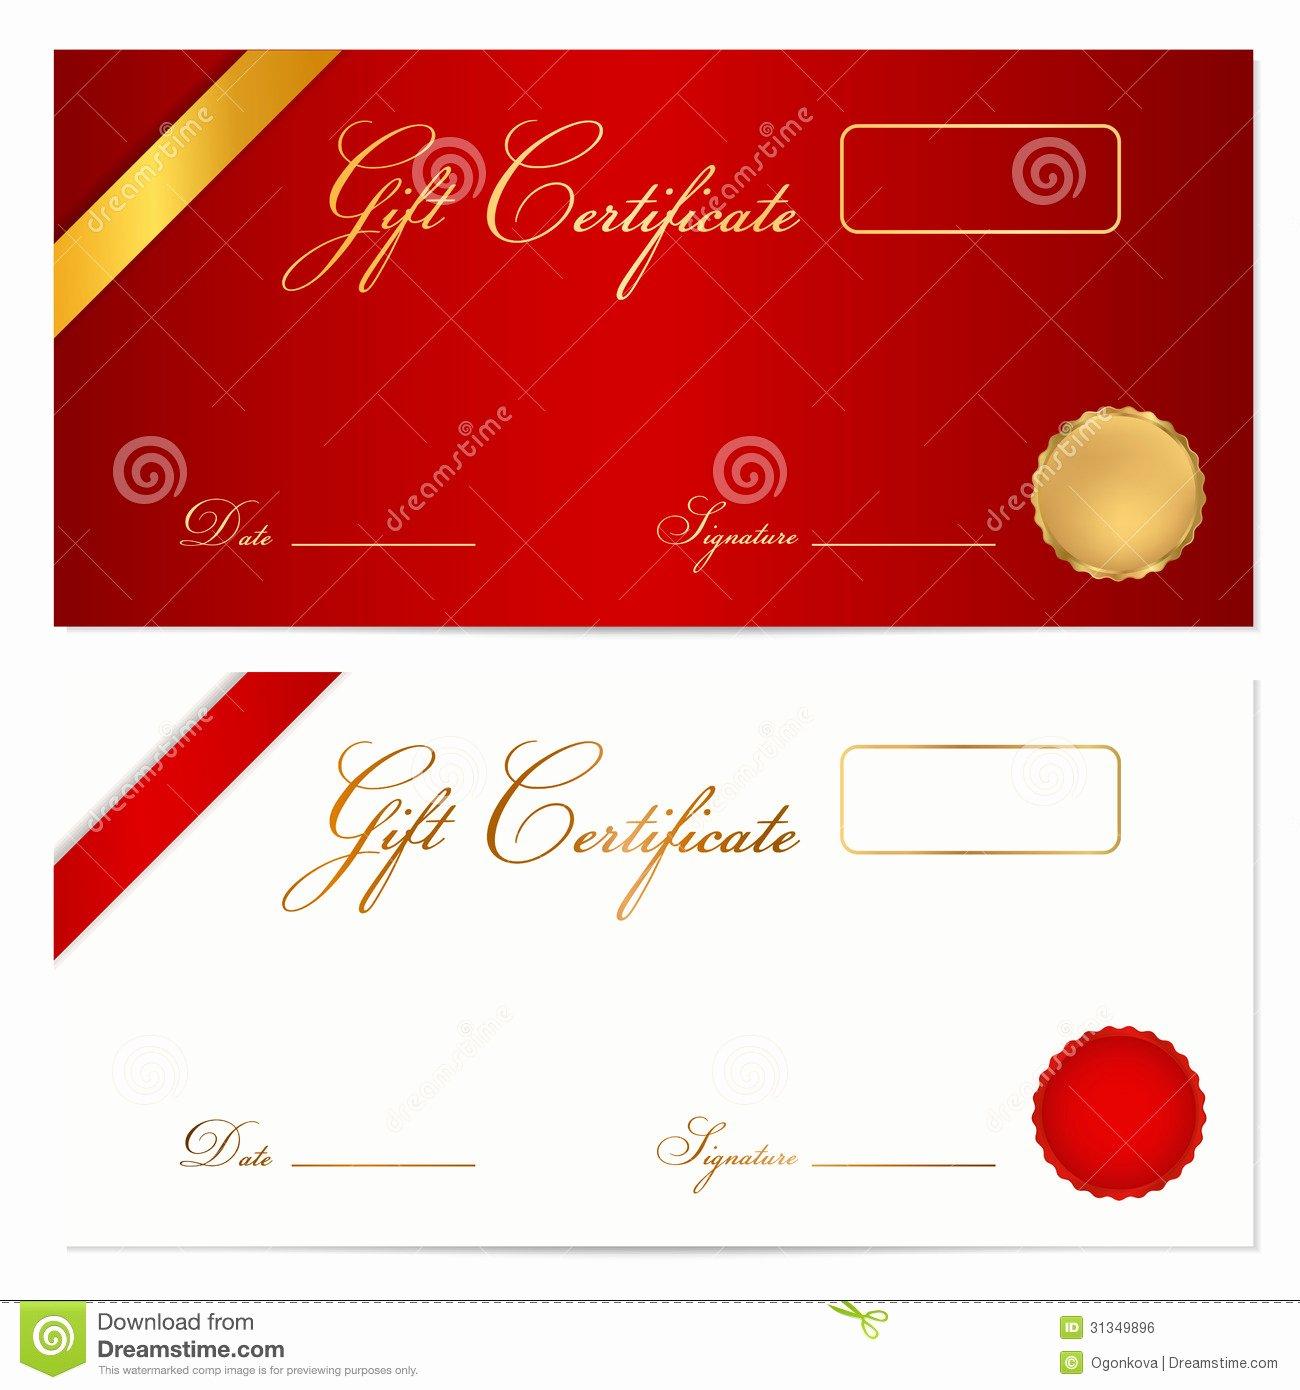 Gift Certificate Voucher Template Wax Seal Stock Vector